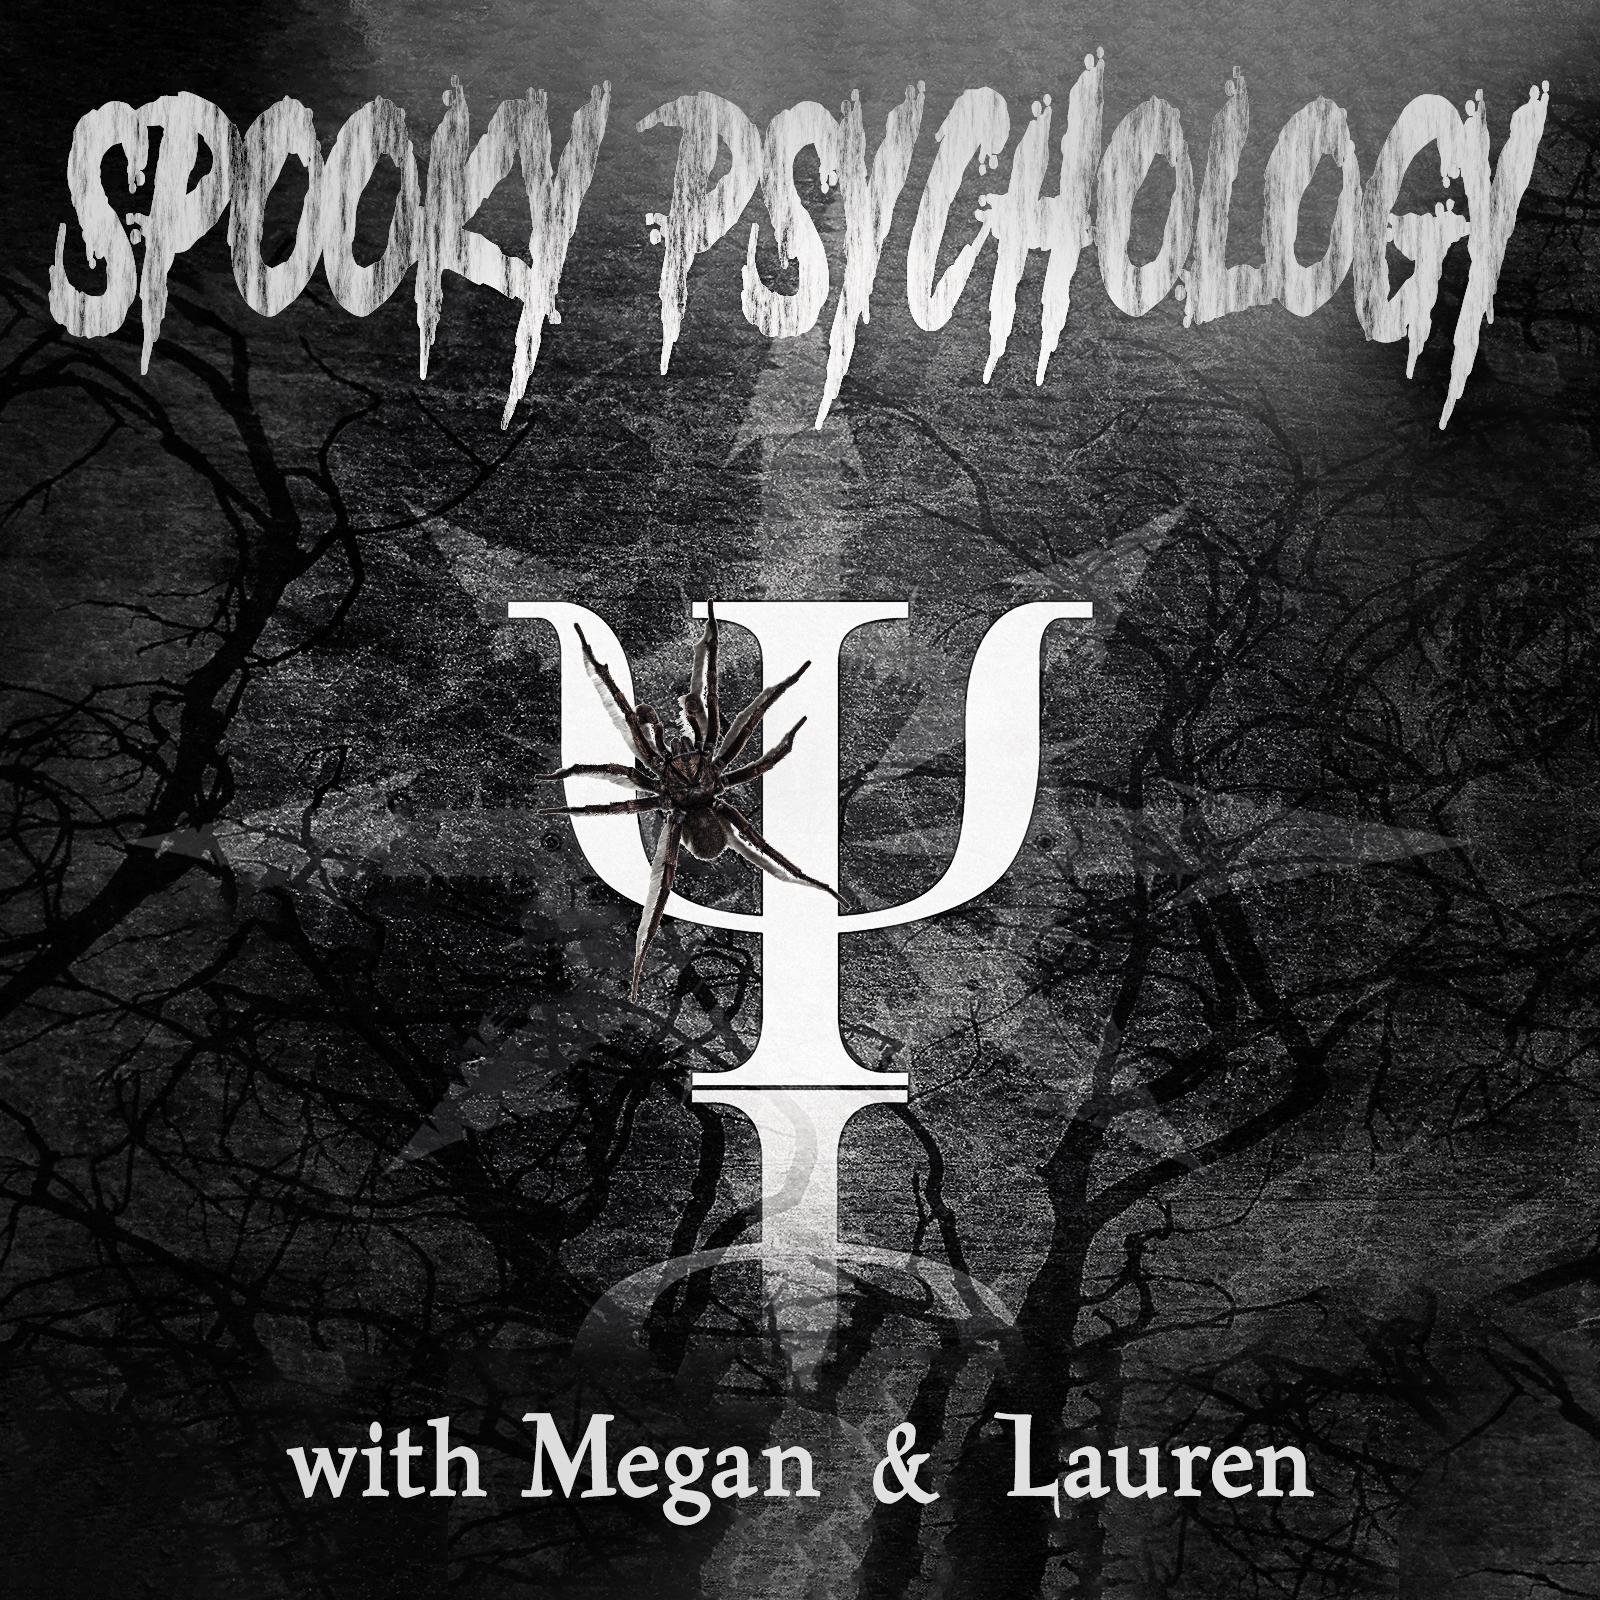 Spooky Psychology show art